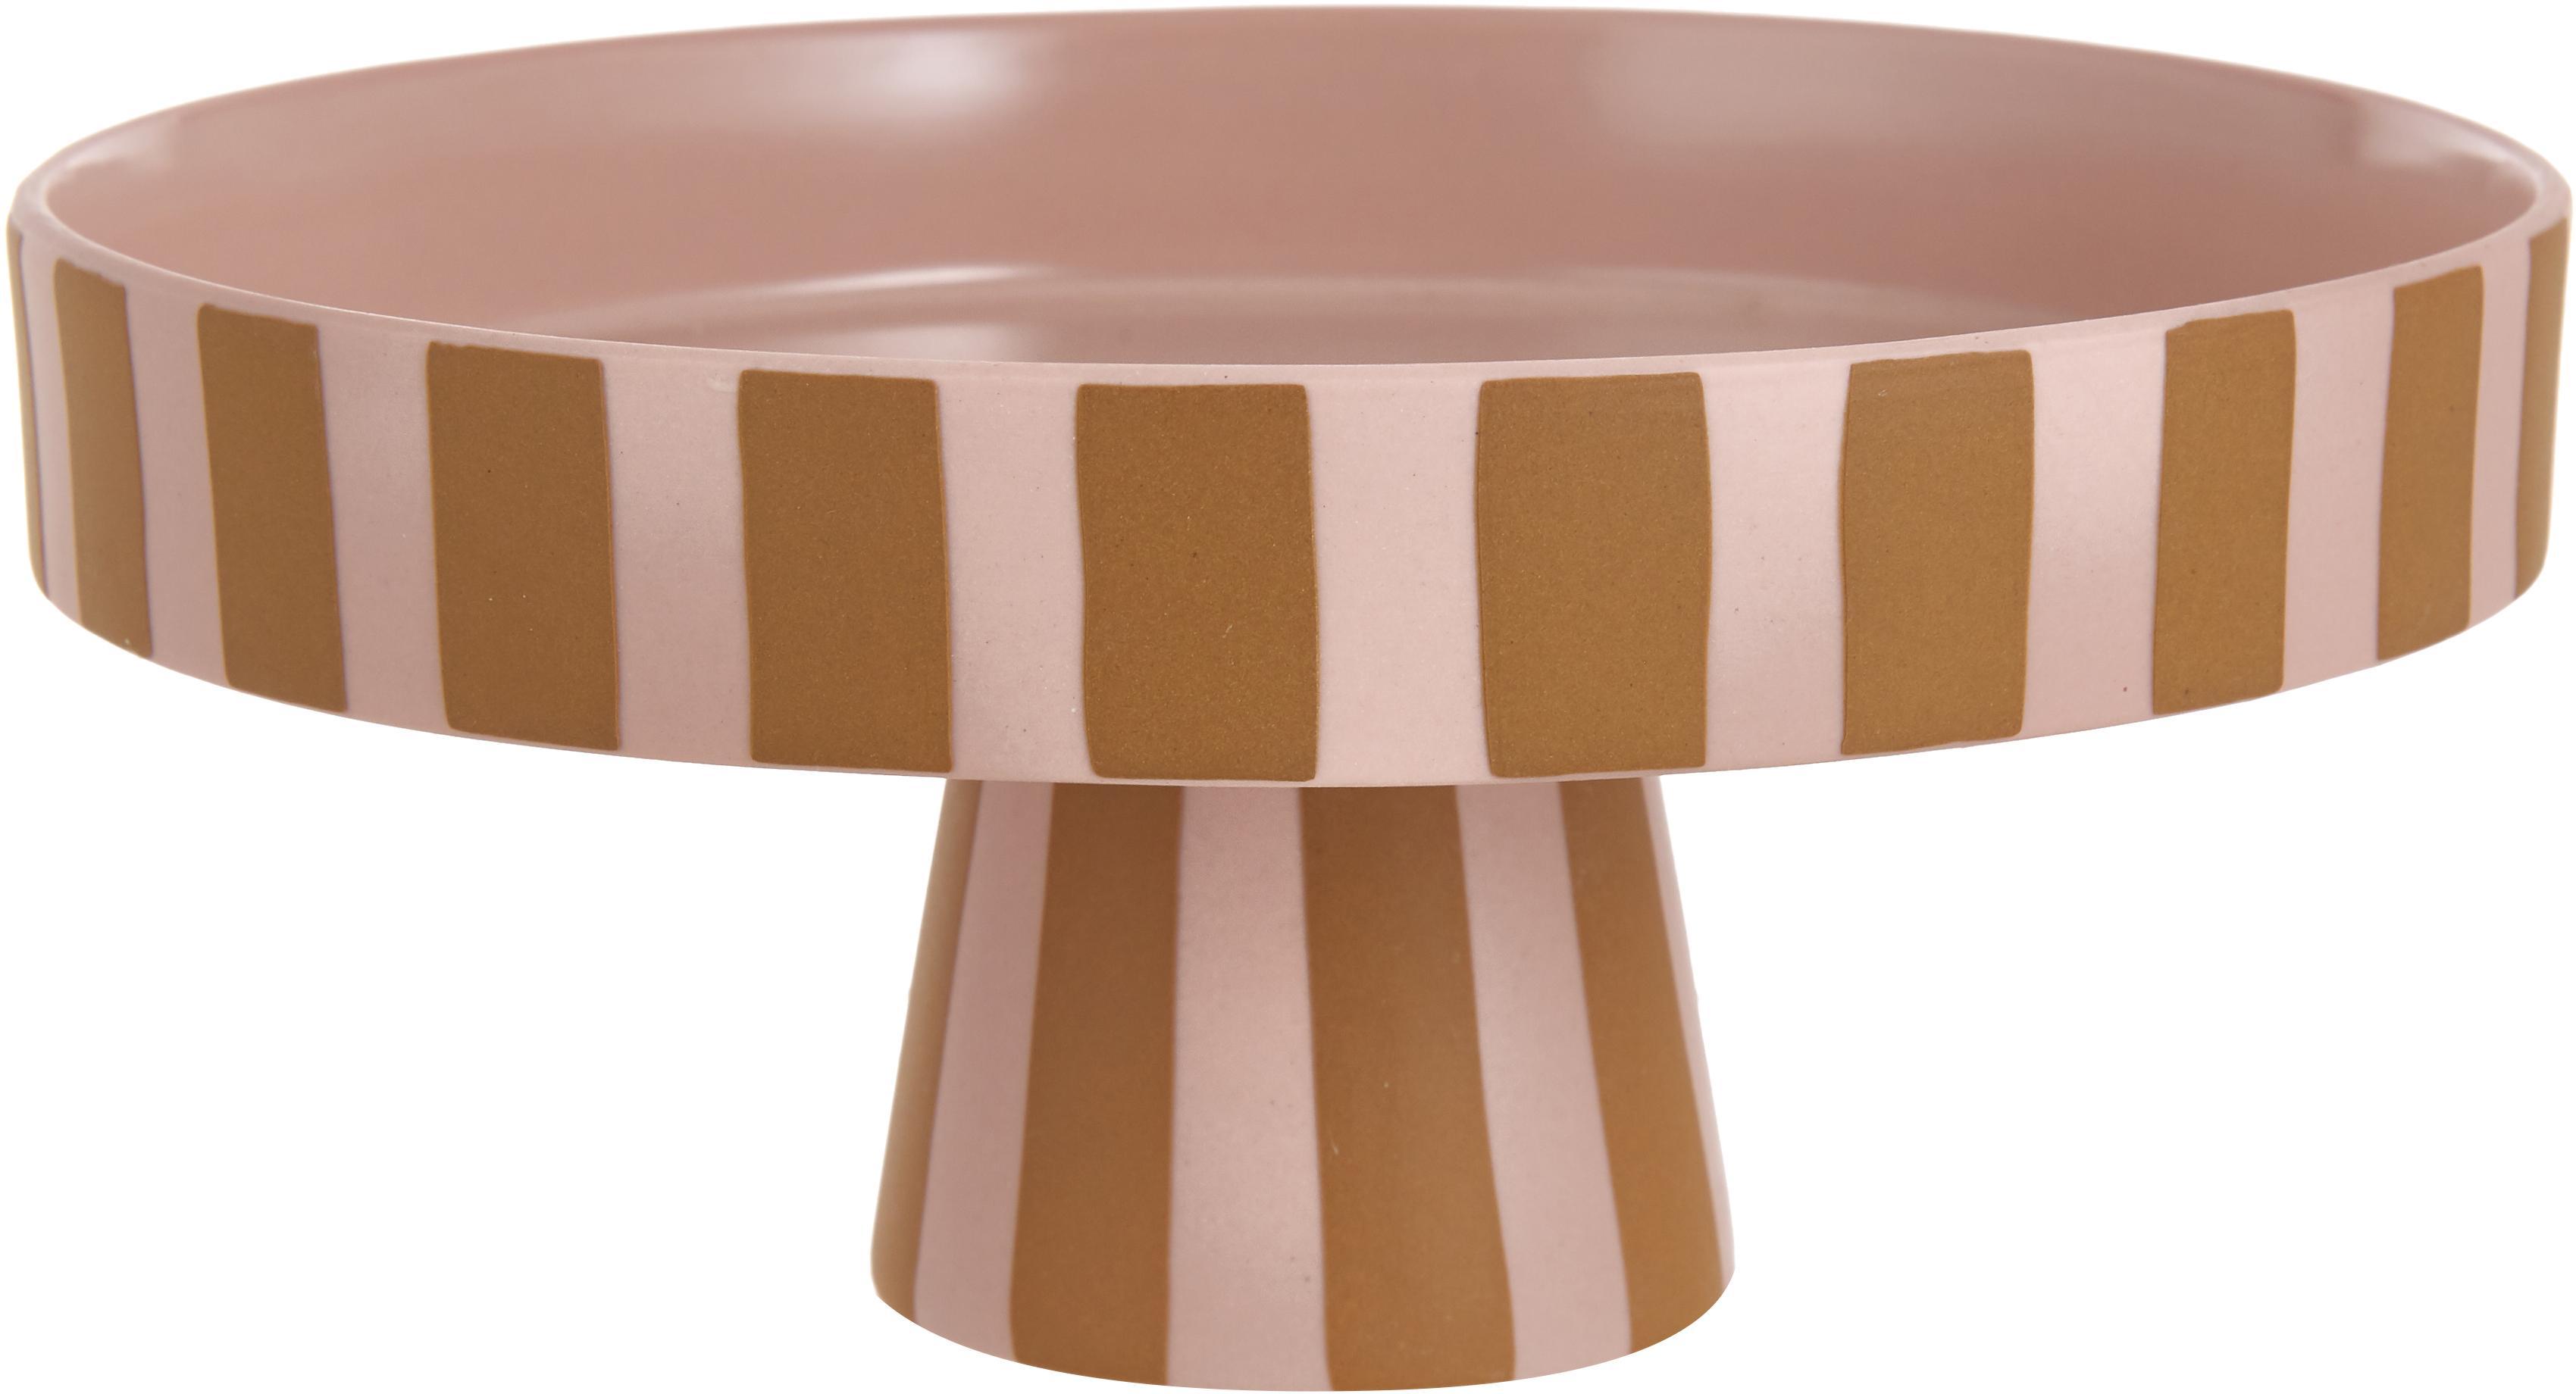 Servierplatte Toppu im Streifendesign, Keramik, Karamellbraun, Rosa, Ø 20 x H 9 cm